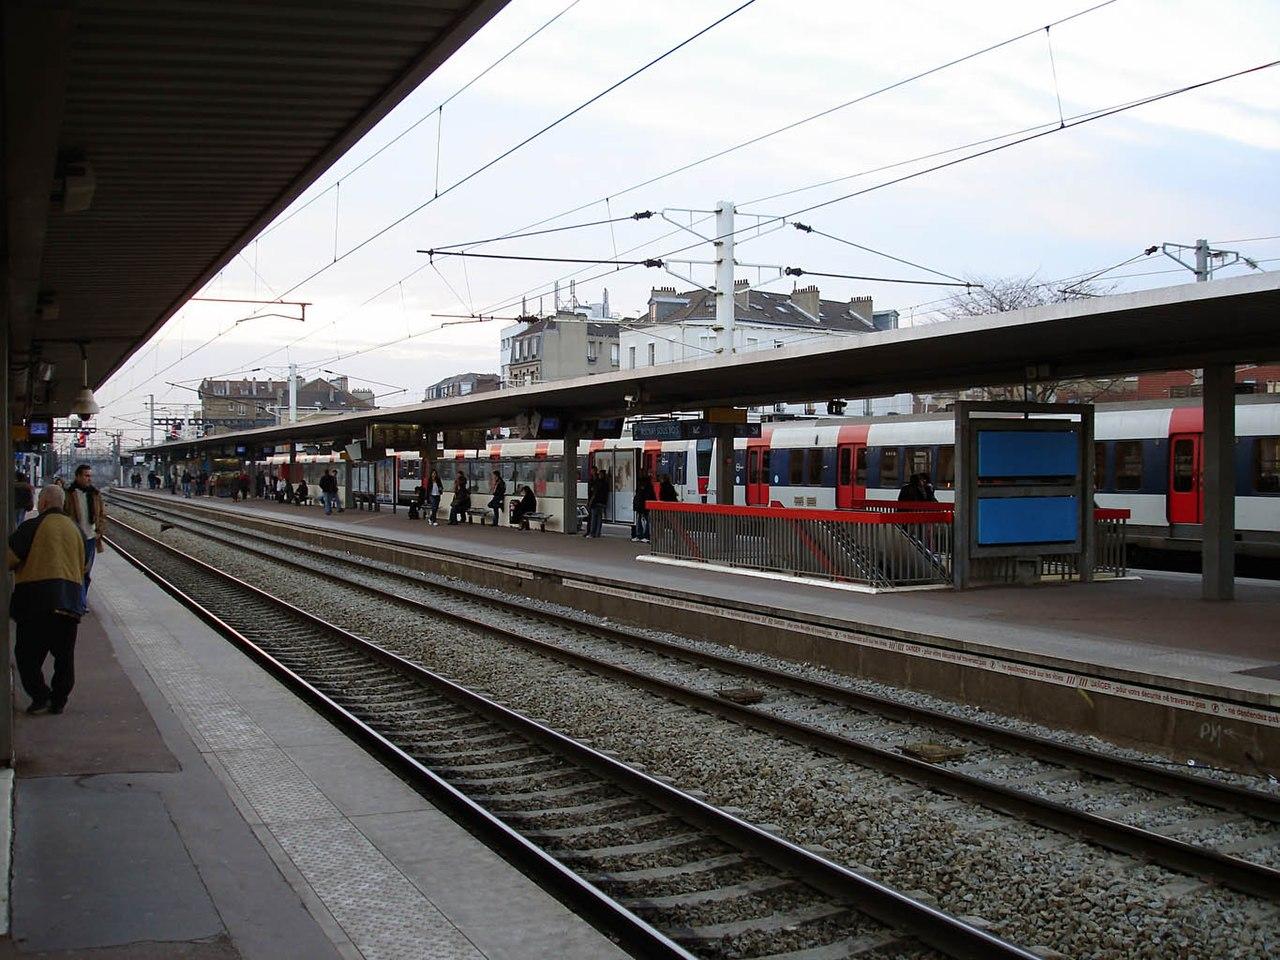 FileGare d AulnaysousBois 03jpg  Wikimedia Commons